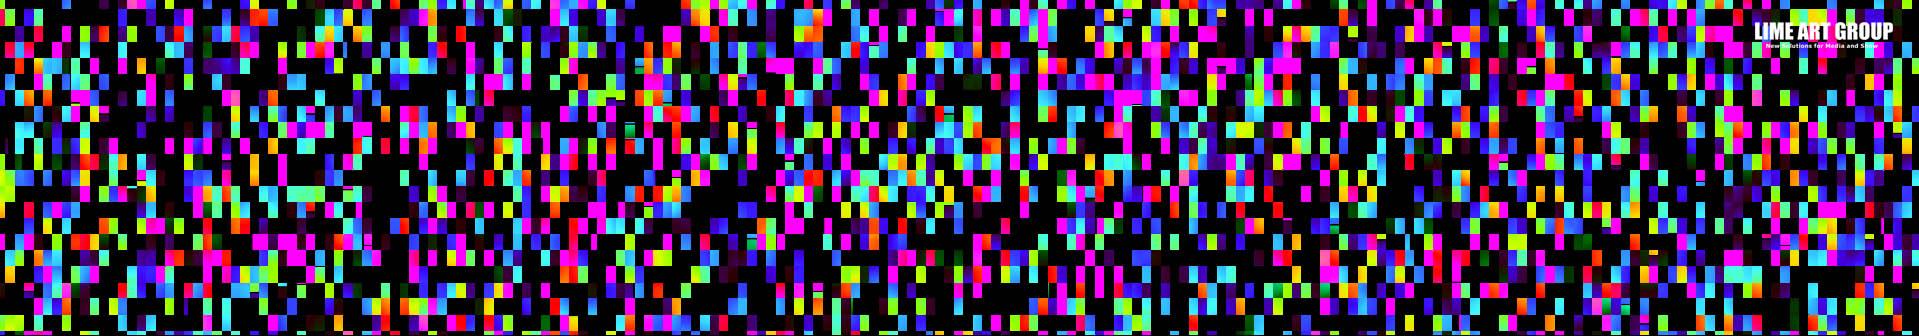 candy vj loops motion background video loop 17